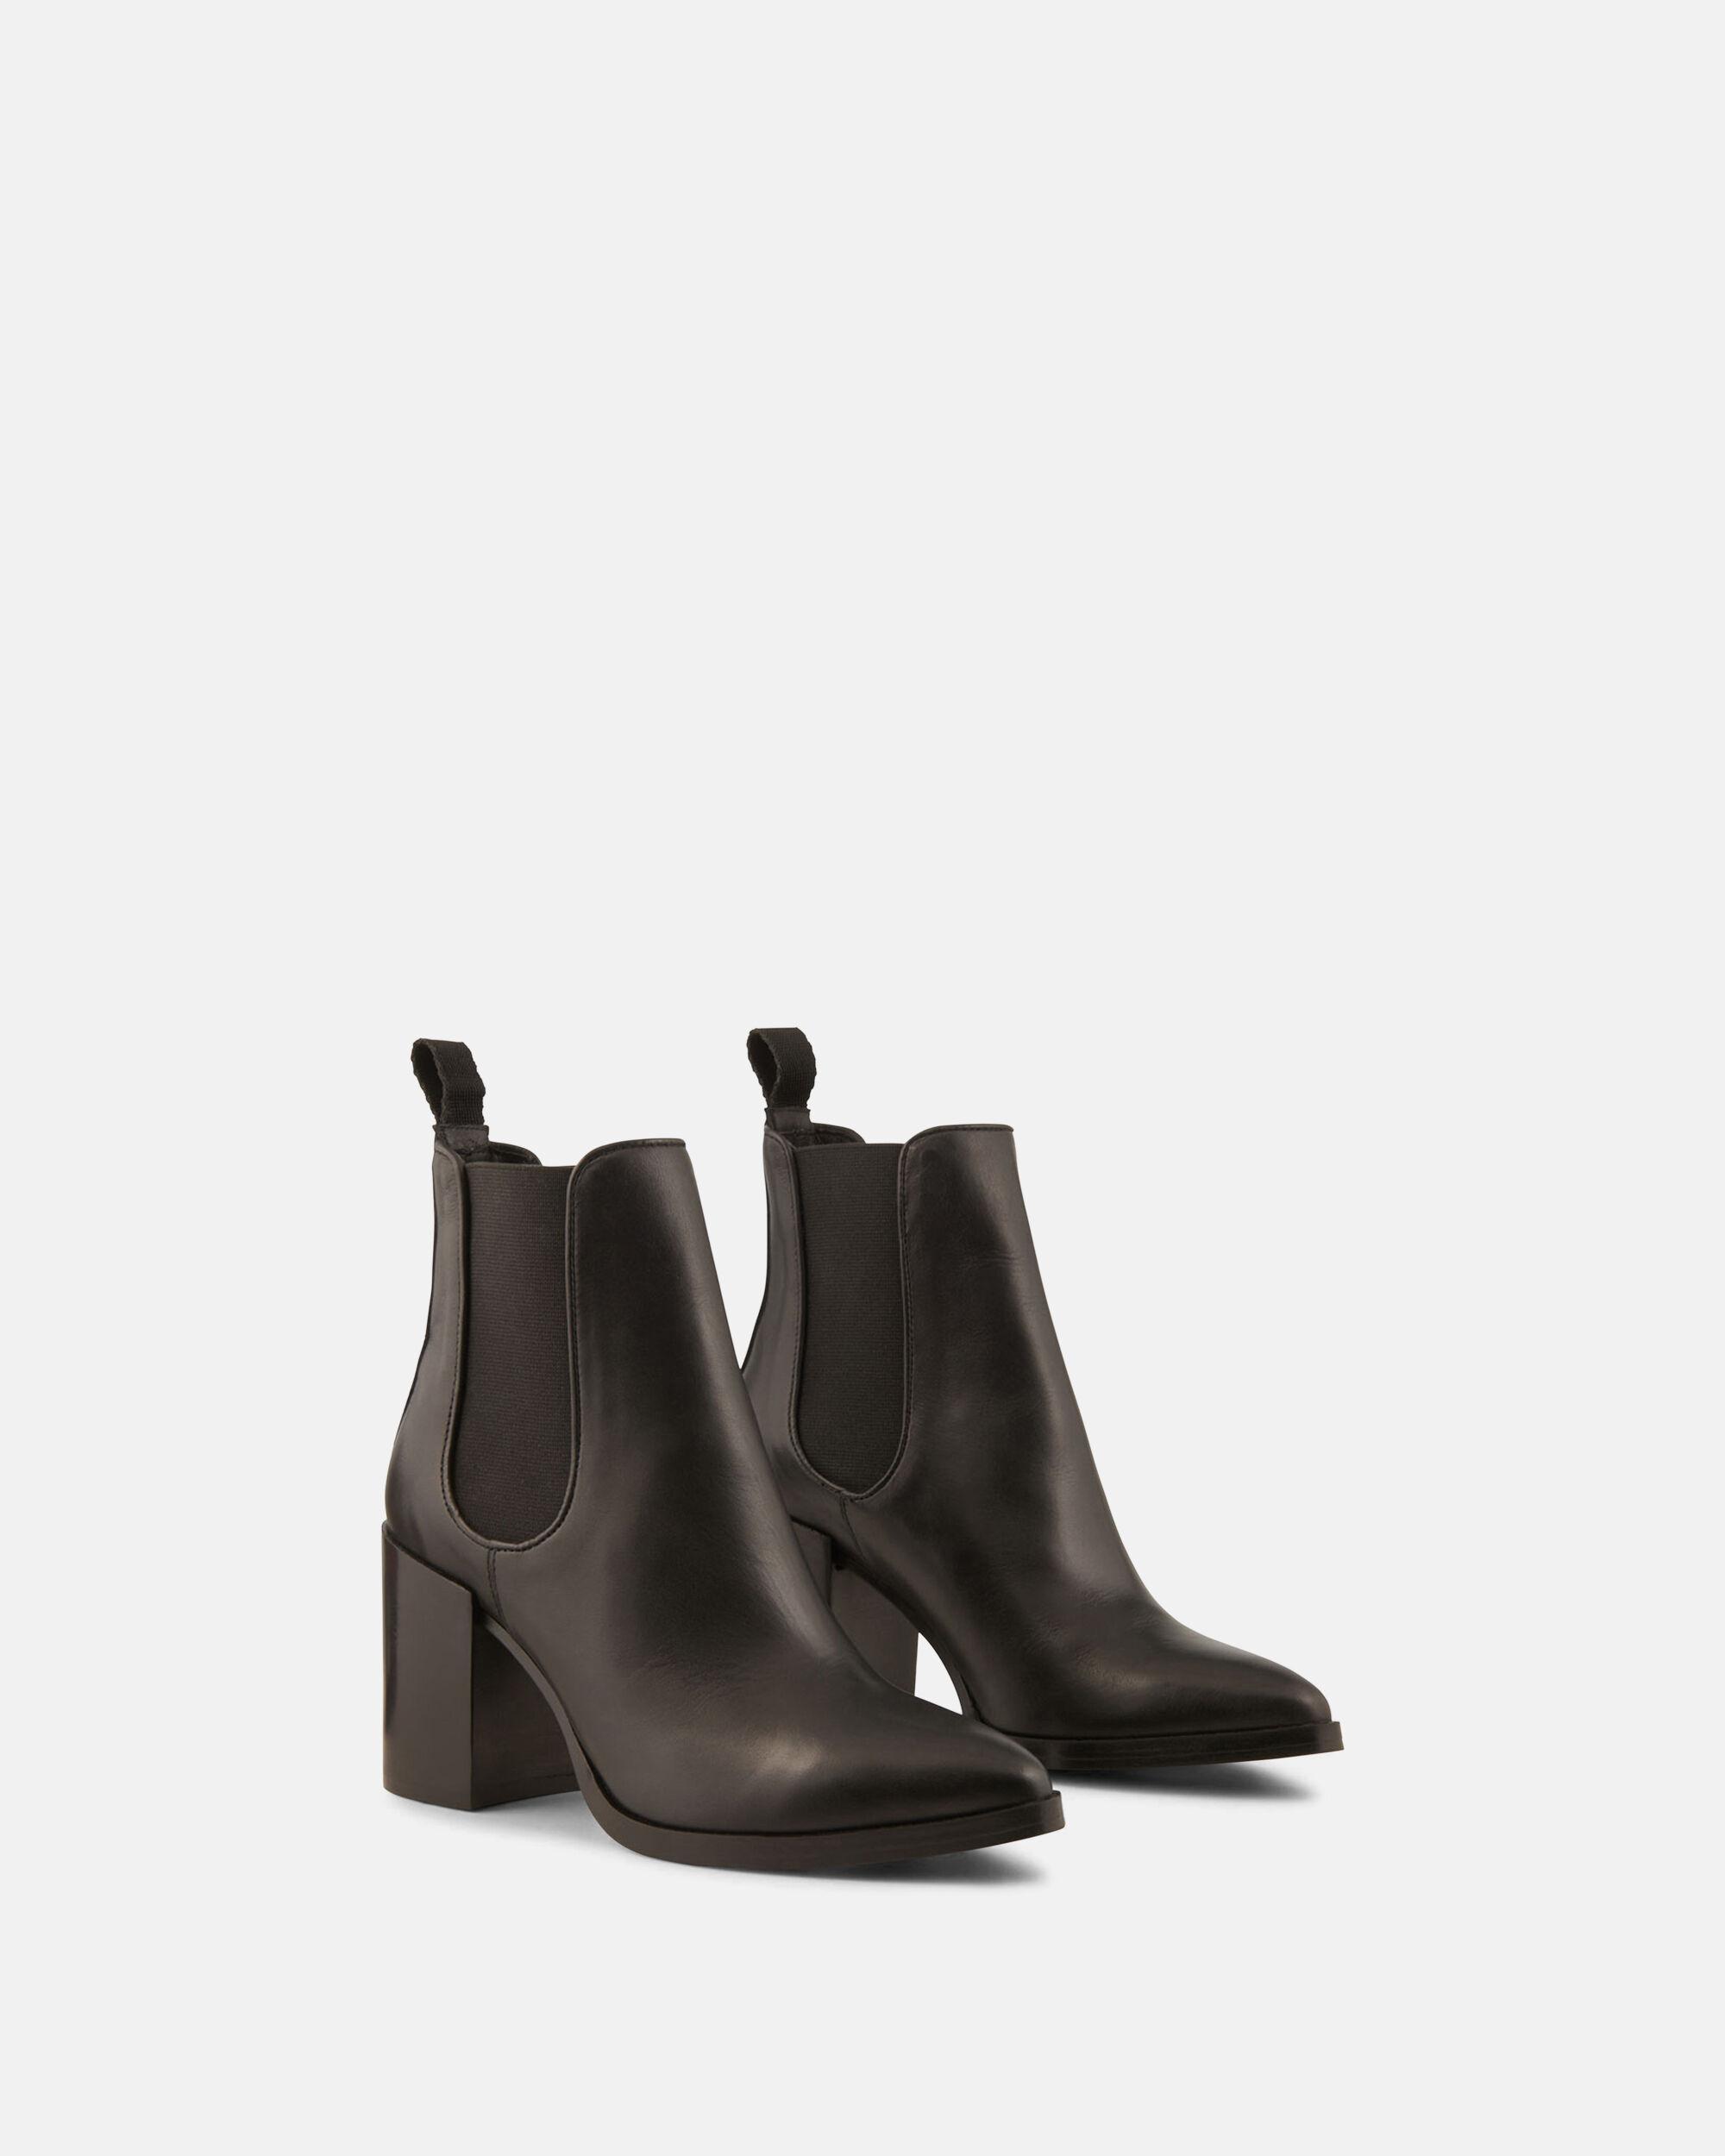 Boots Femme Femme Femme Femme Boots Boots Femme Boots Boots Femme Femme Boots Boots Boots OOq6YB